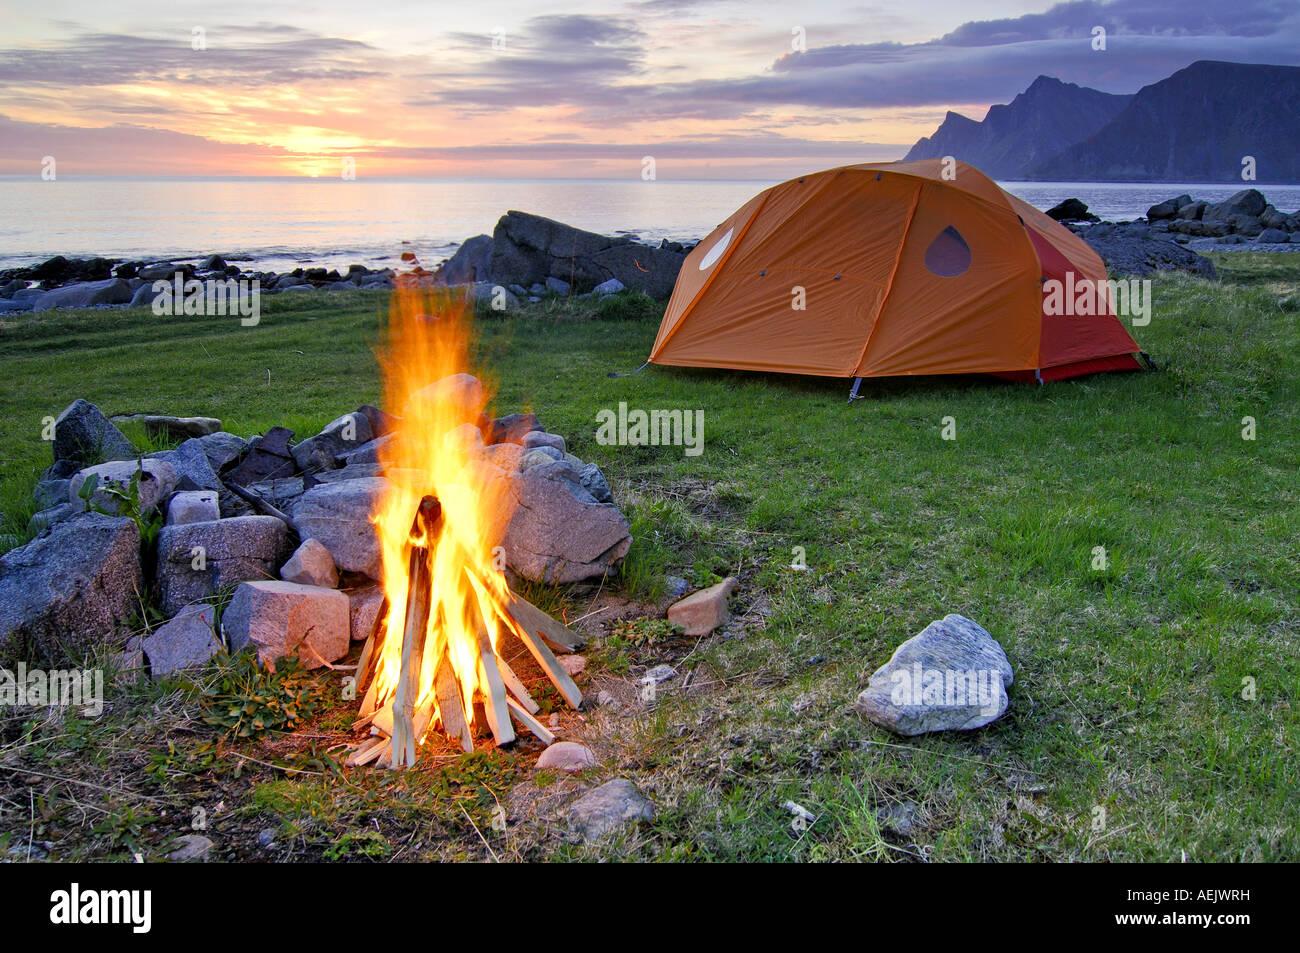 Campfire with tent, midnight sun, Austvagoy, Lofoten, Norway, Scandinavia, Europe - Stock Image